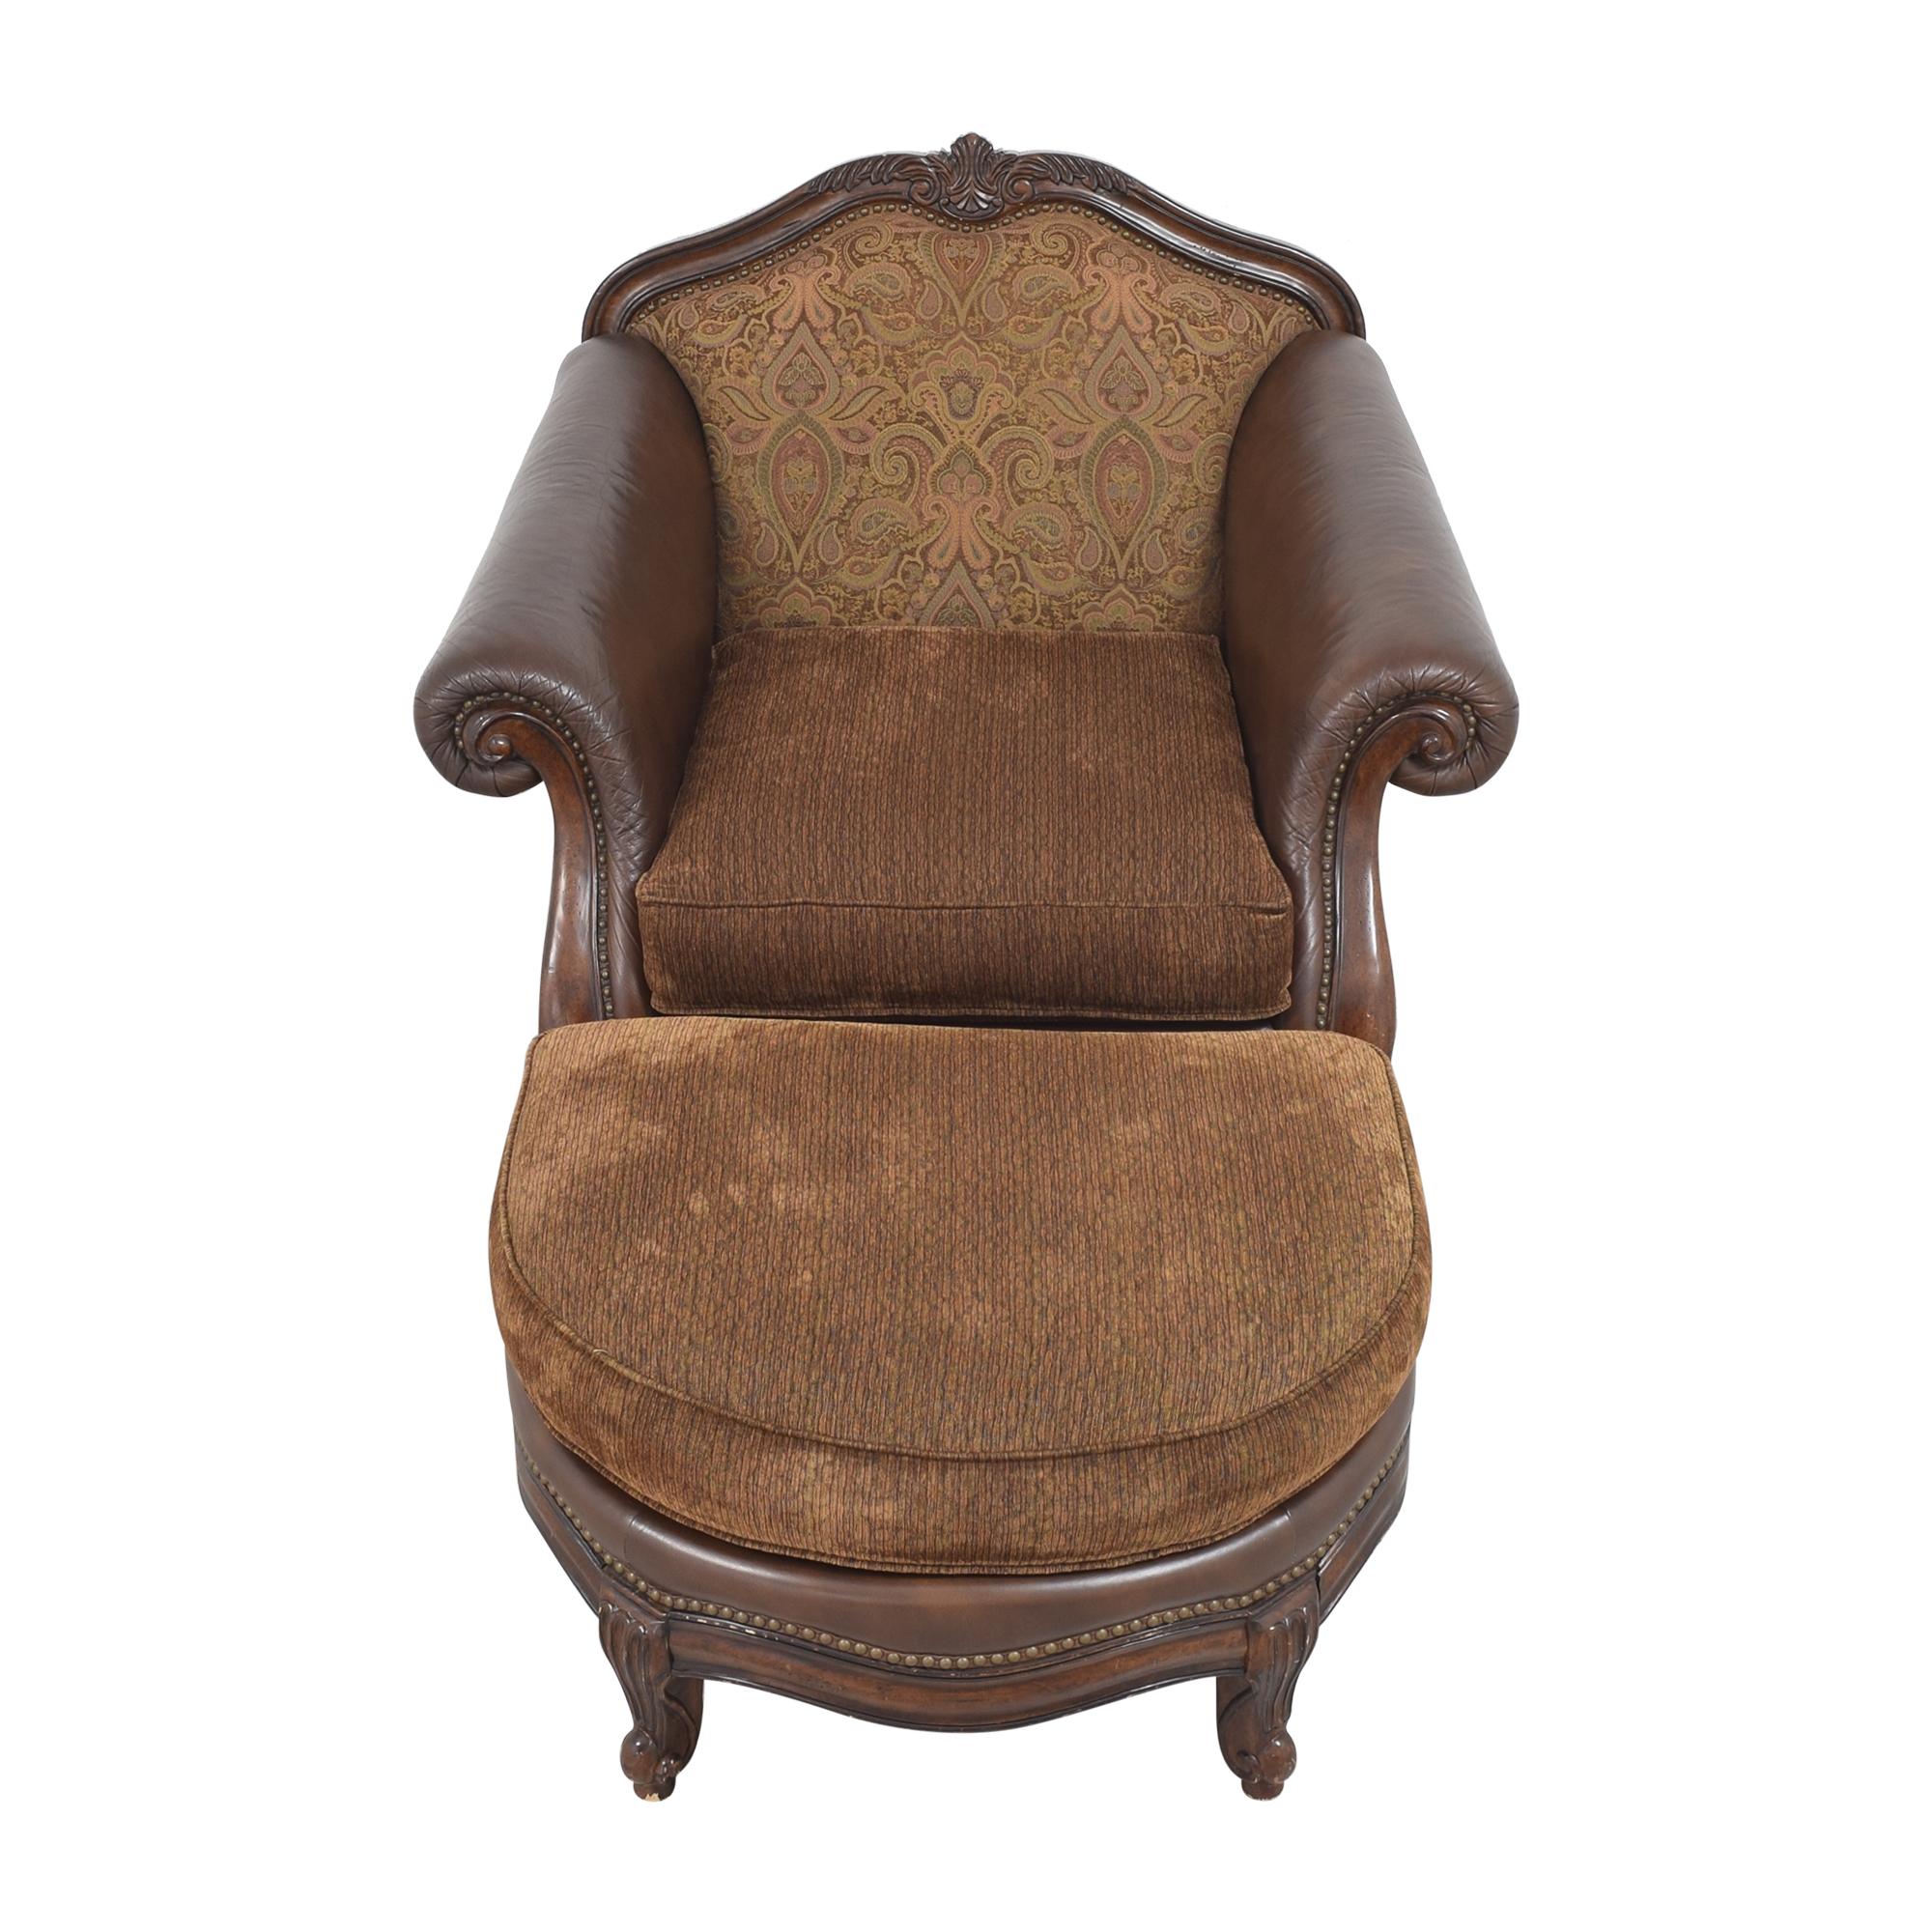 buy Raymour & Flanigan Raymour & Flanigan Natalia Chair with Ottoman online